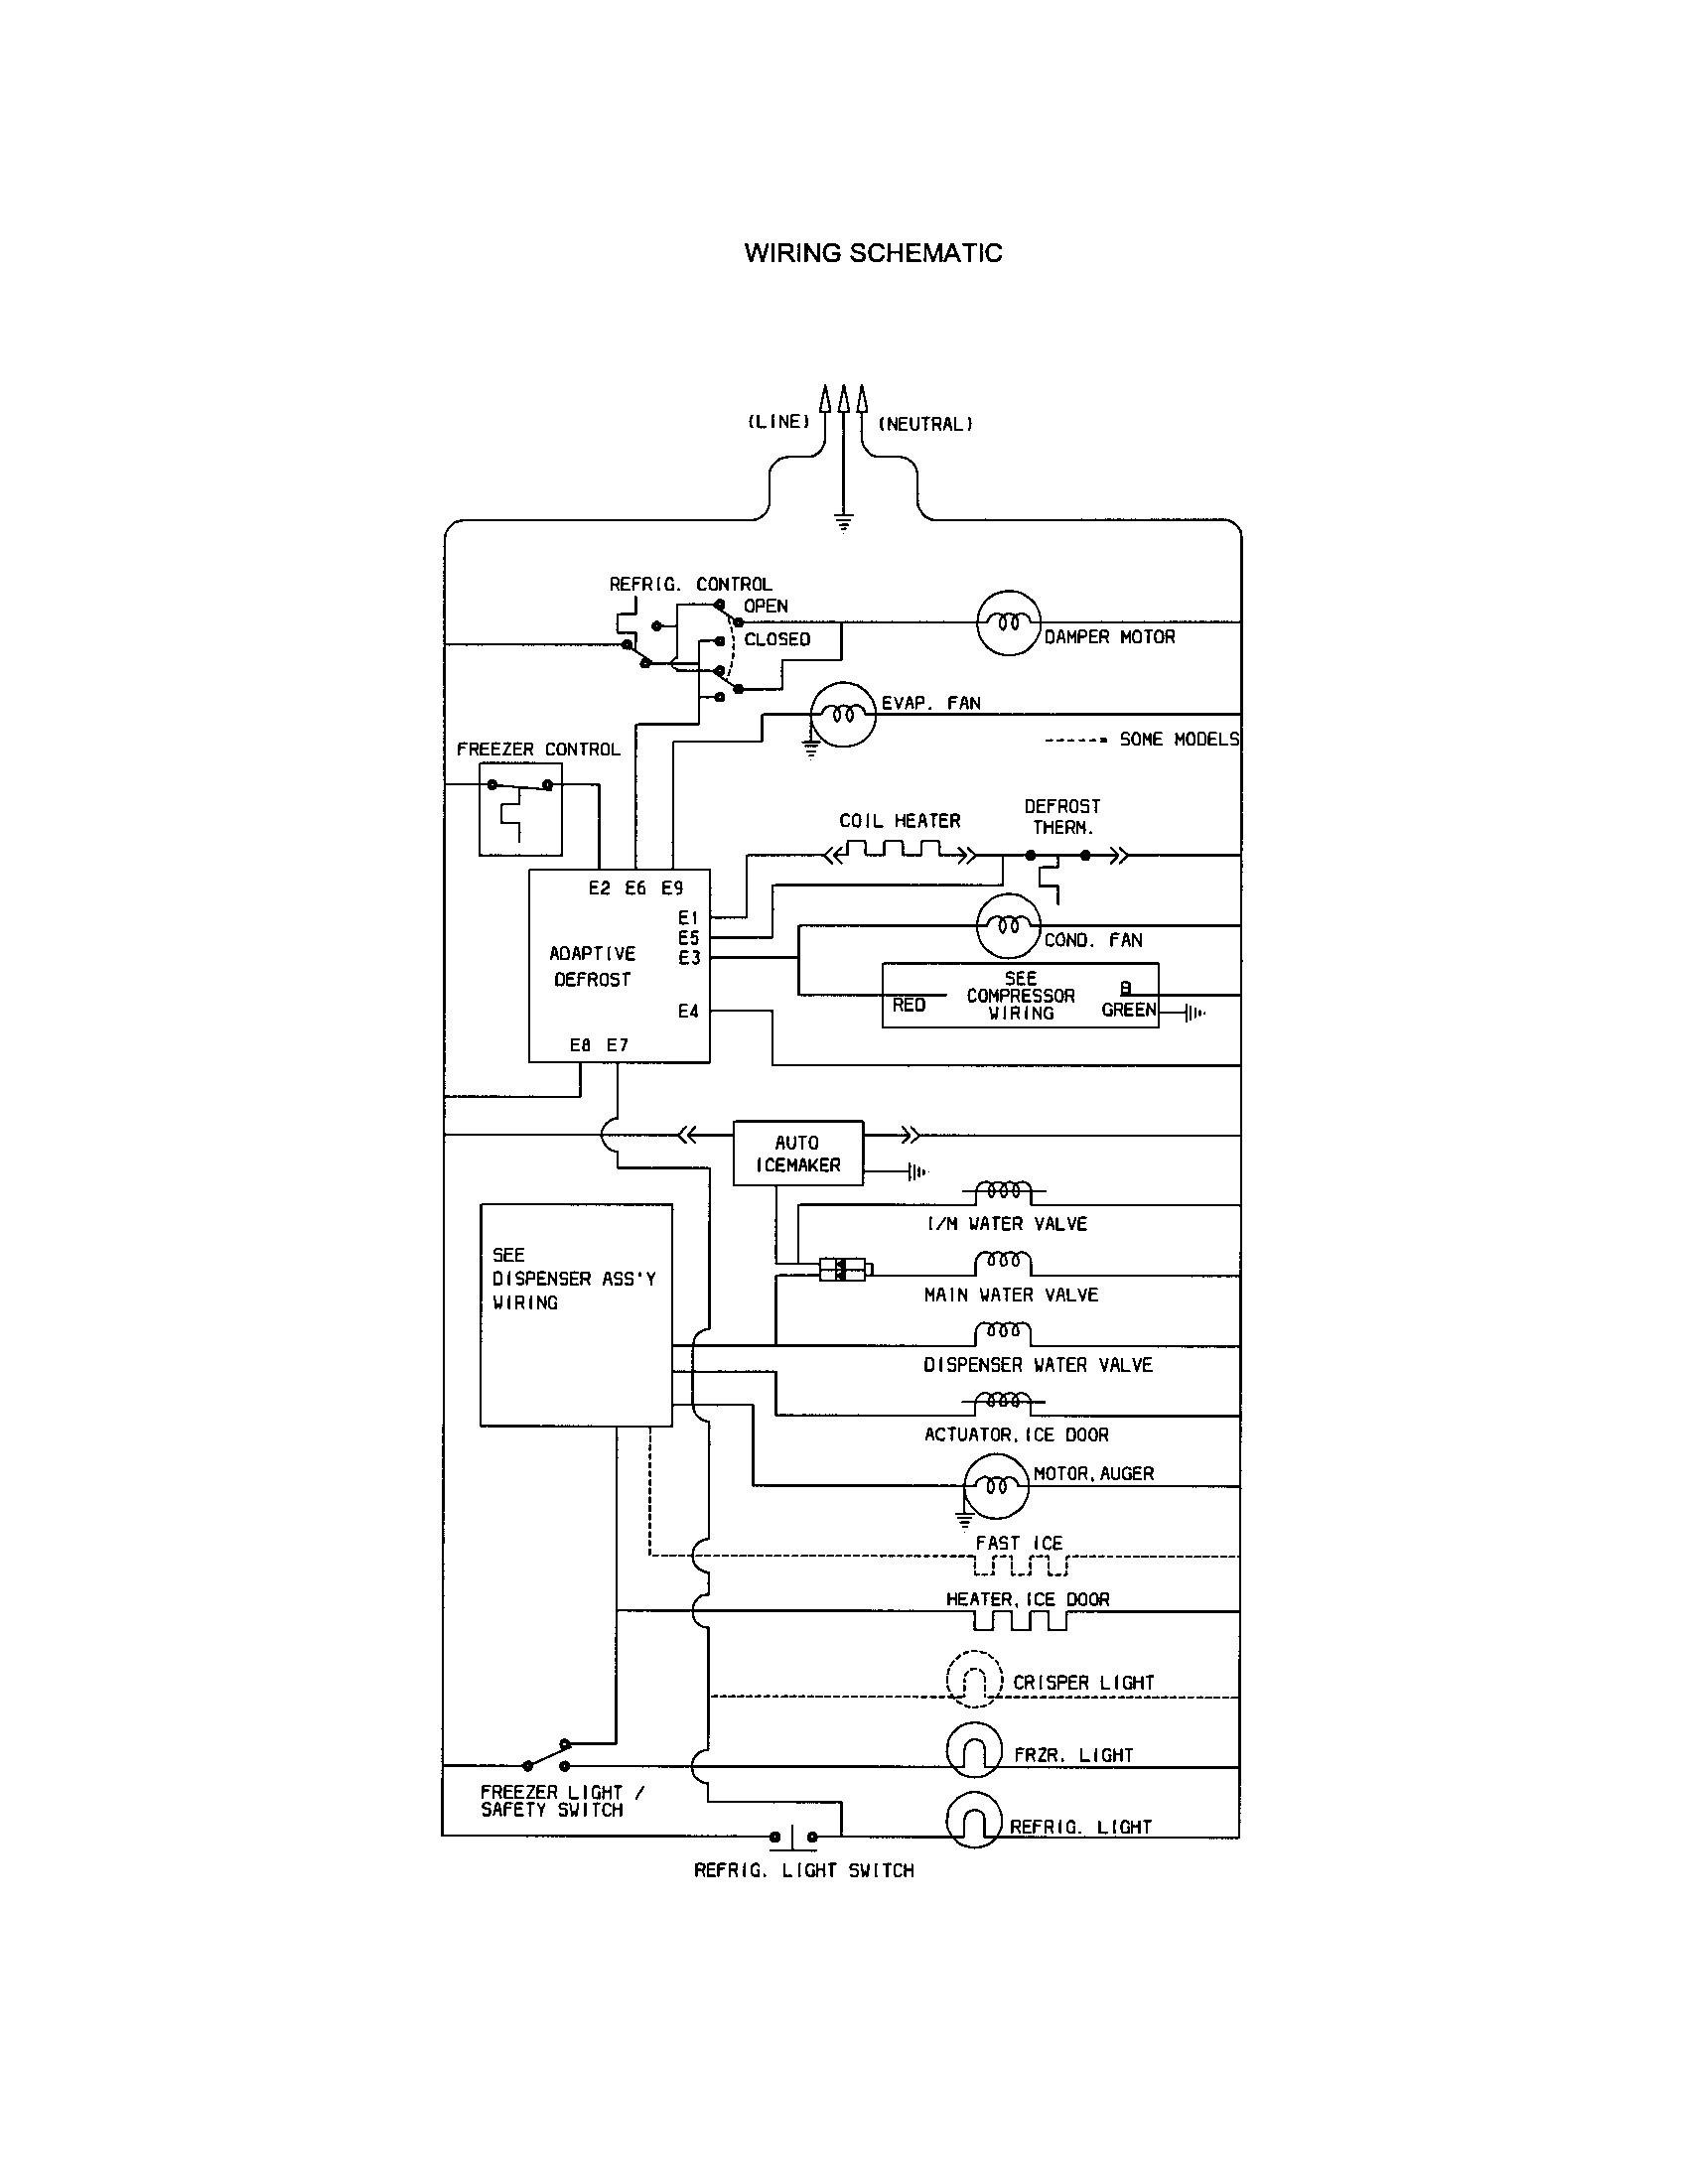 Refrigeration Wiring Diagram Symbols Inspirationa Kenmore Elite Refrigerator Wiring Diagram Roc Grp